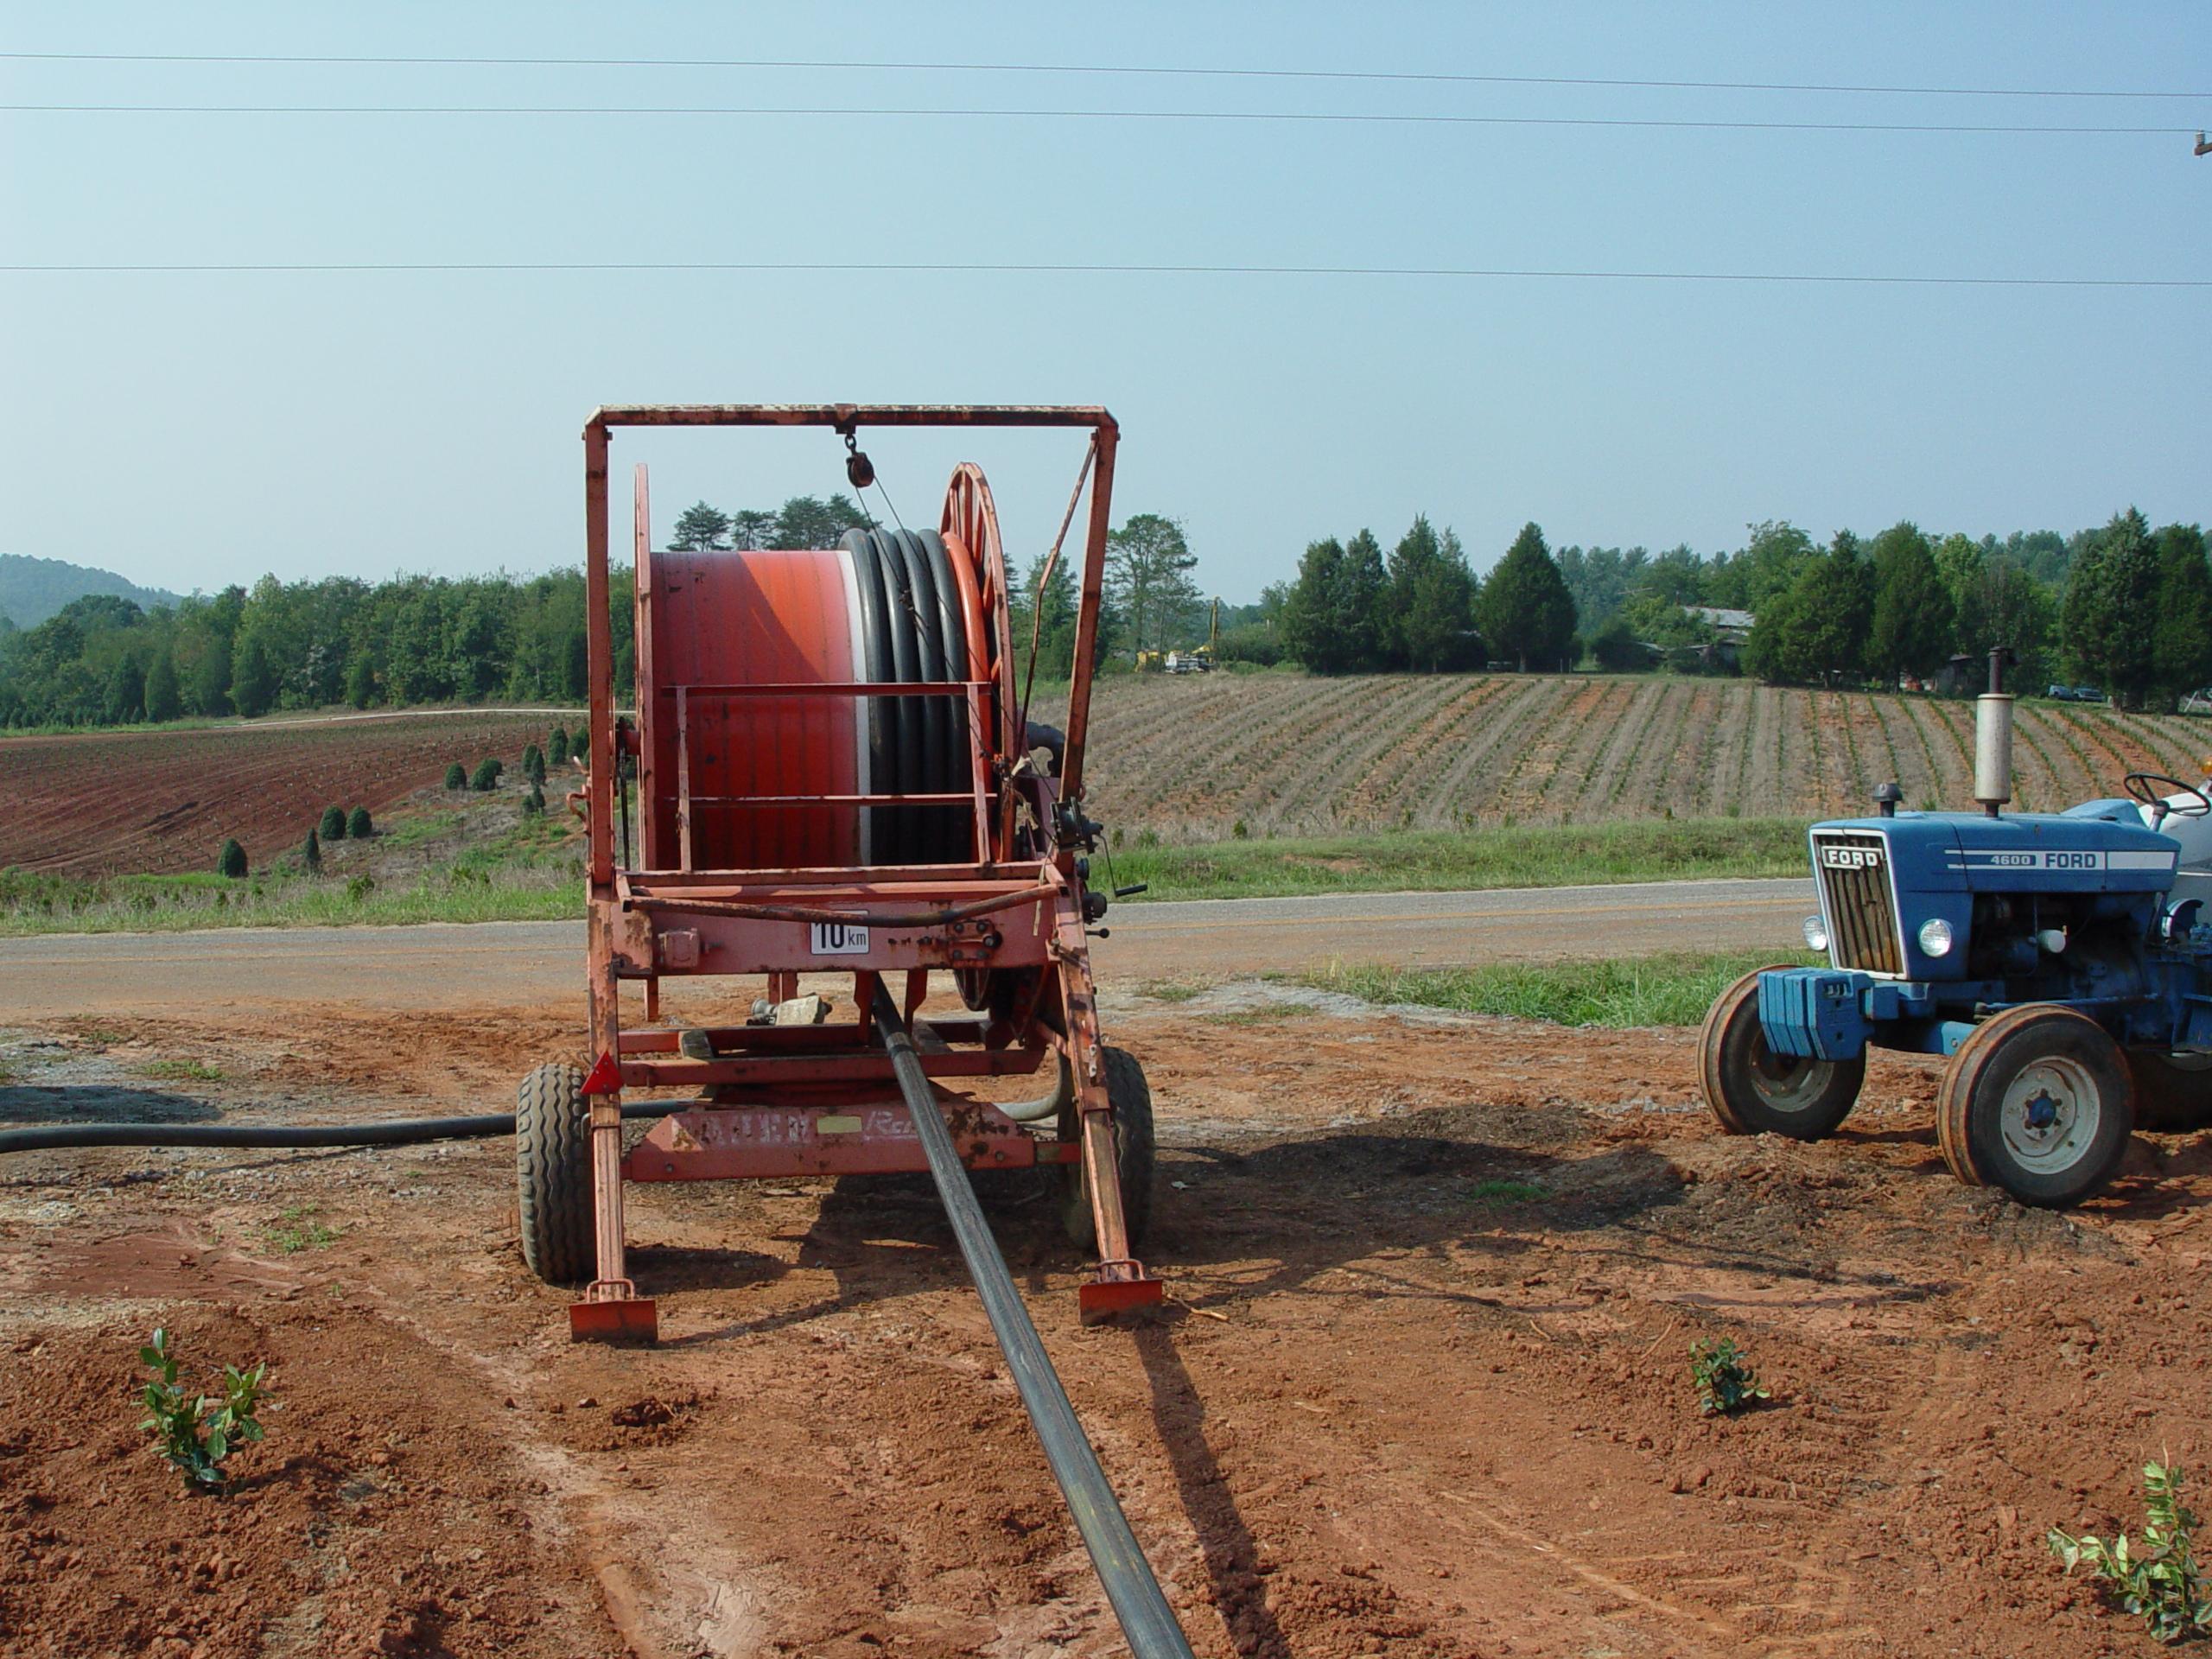 Hose reel for field crops